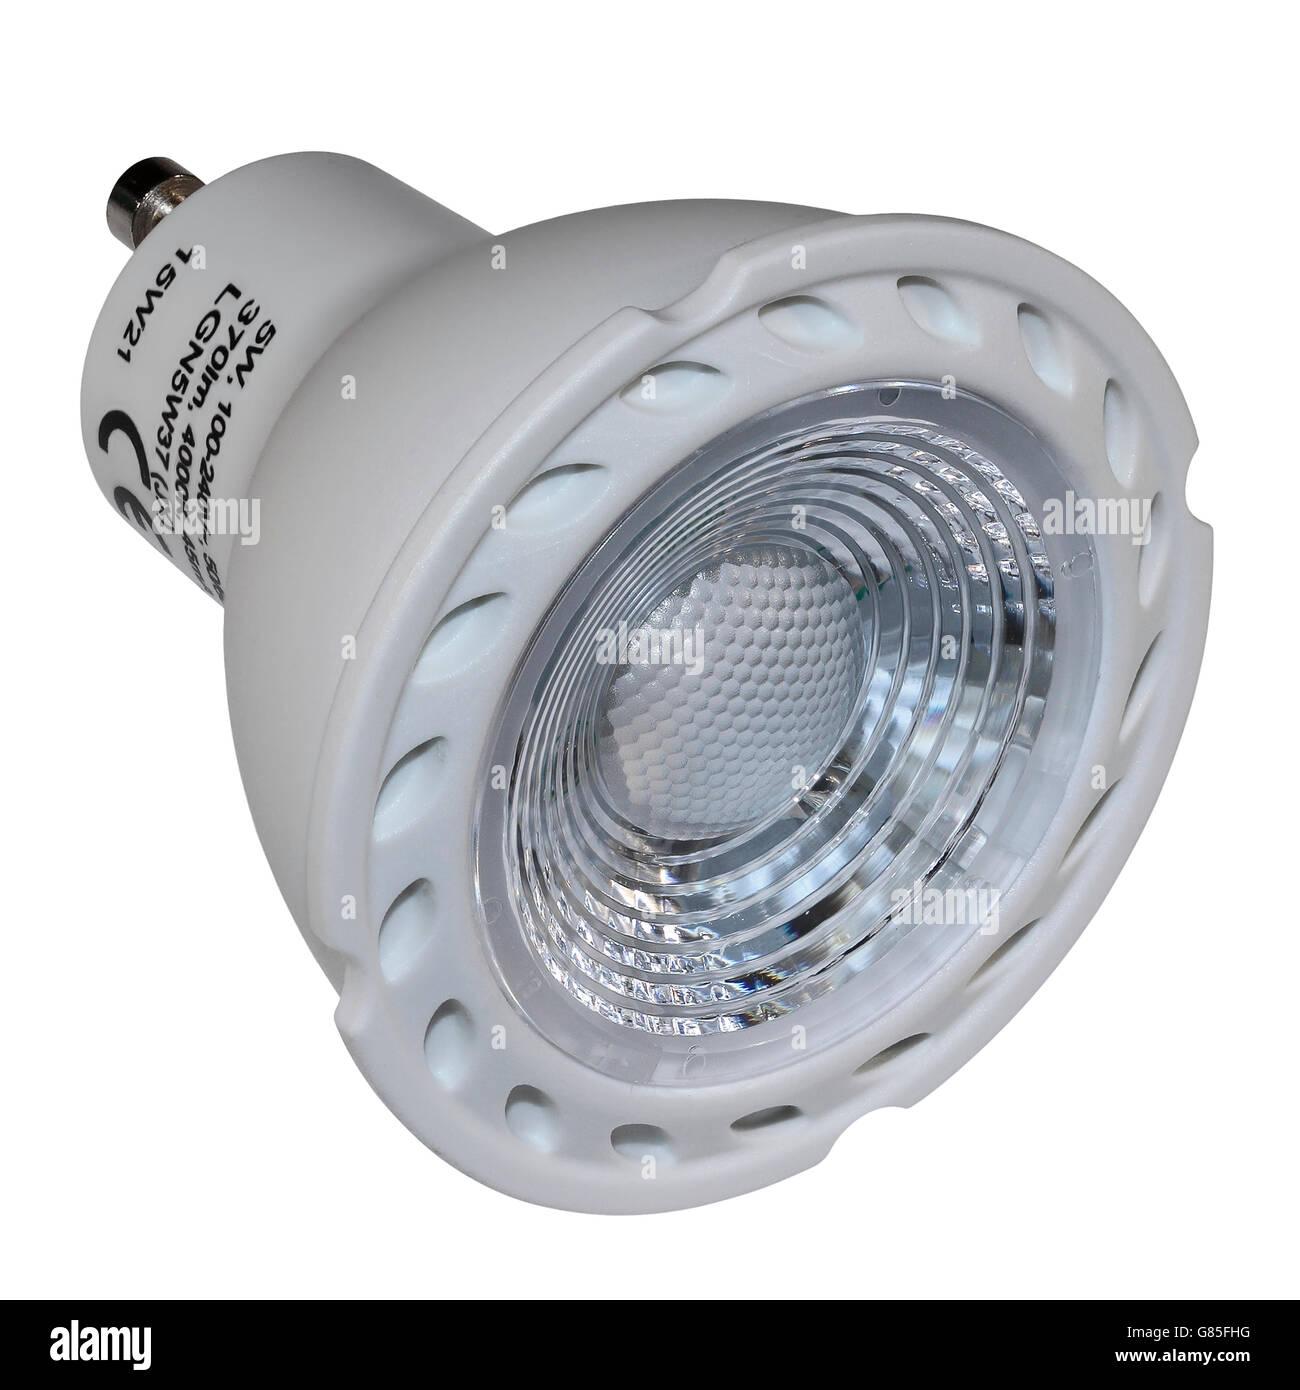 GU10 LED Electric Light Bulb - Stock Image